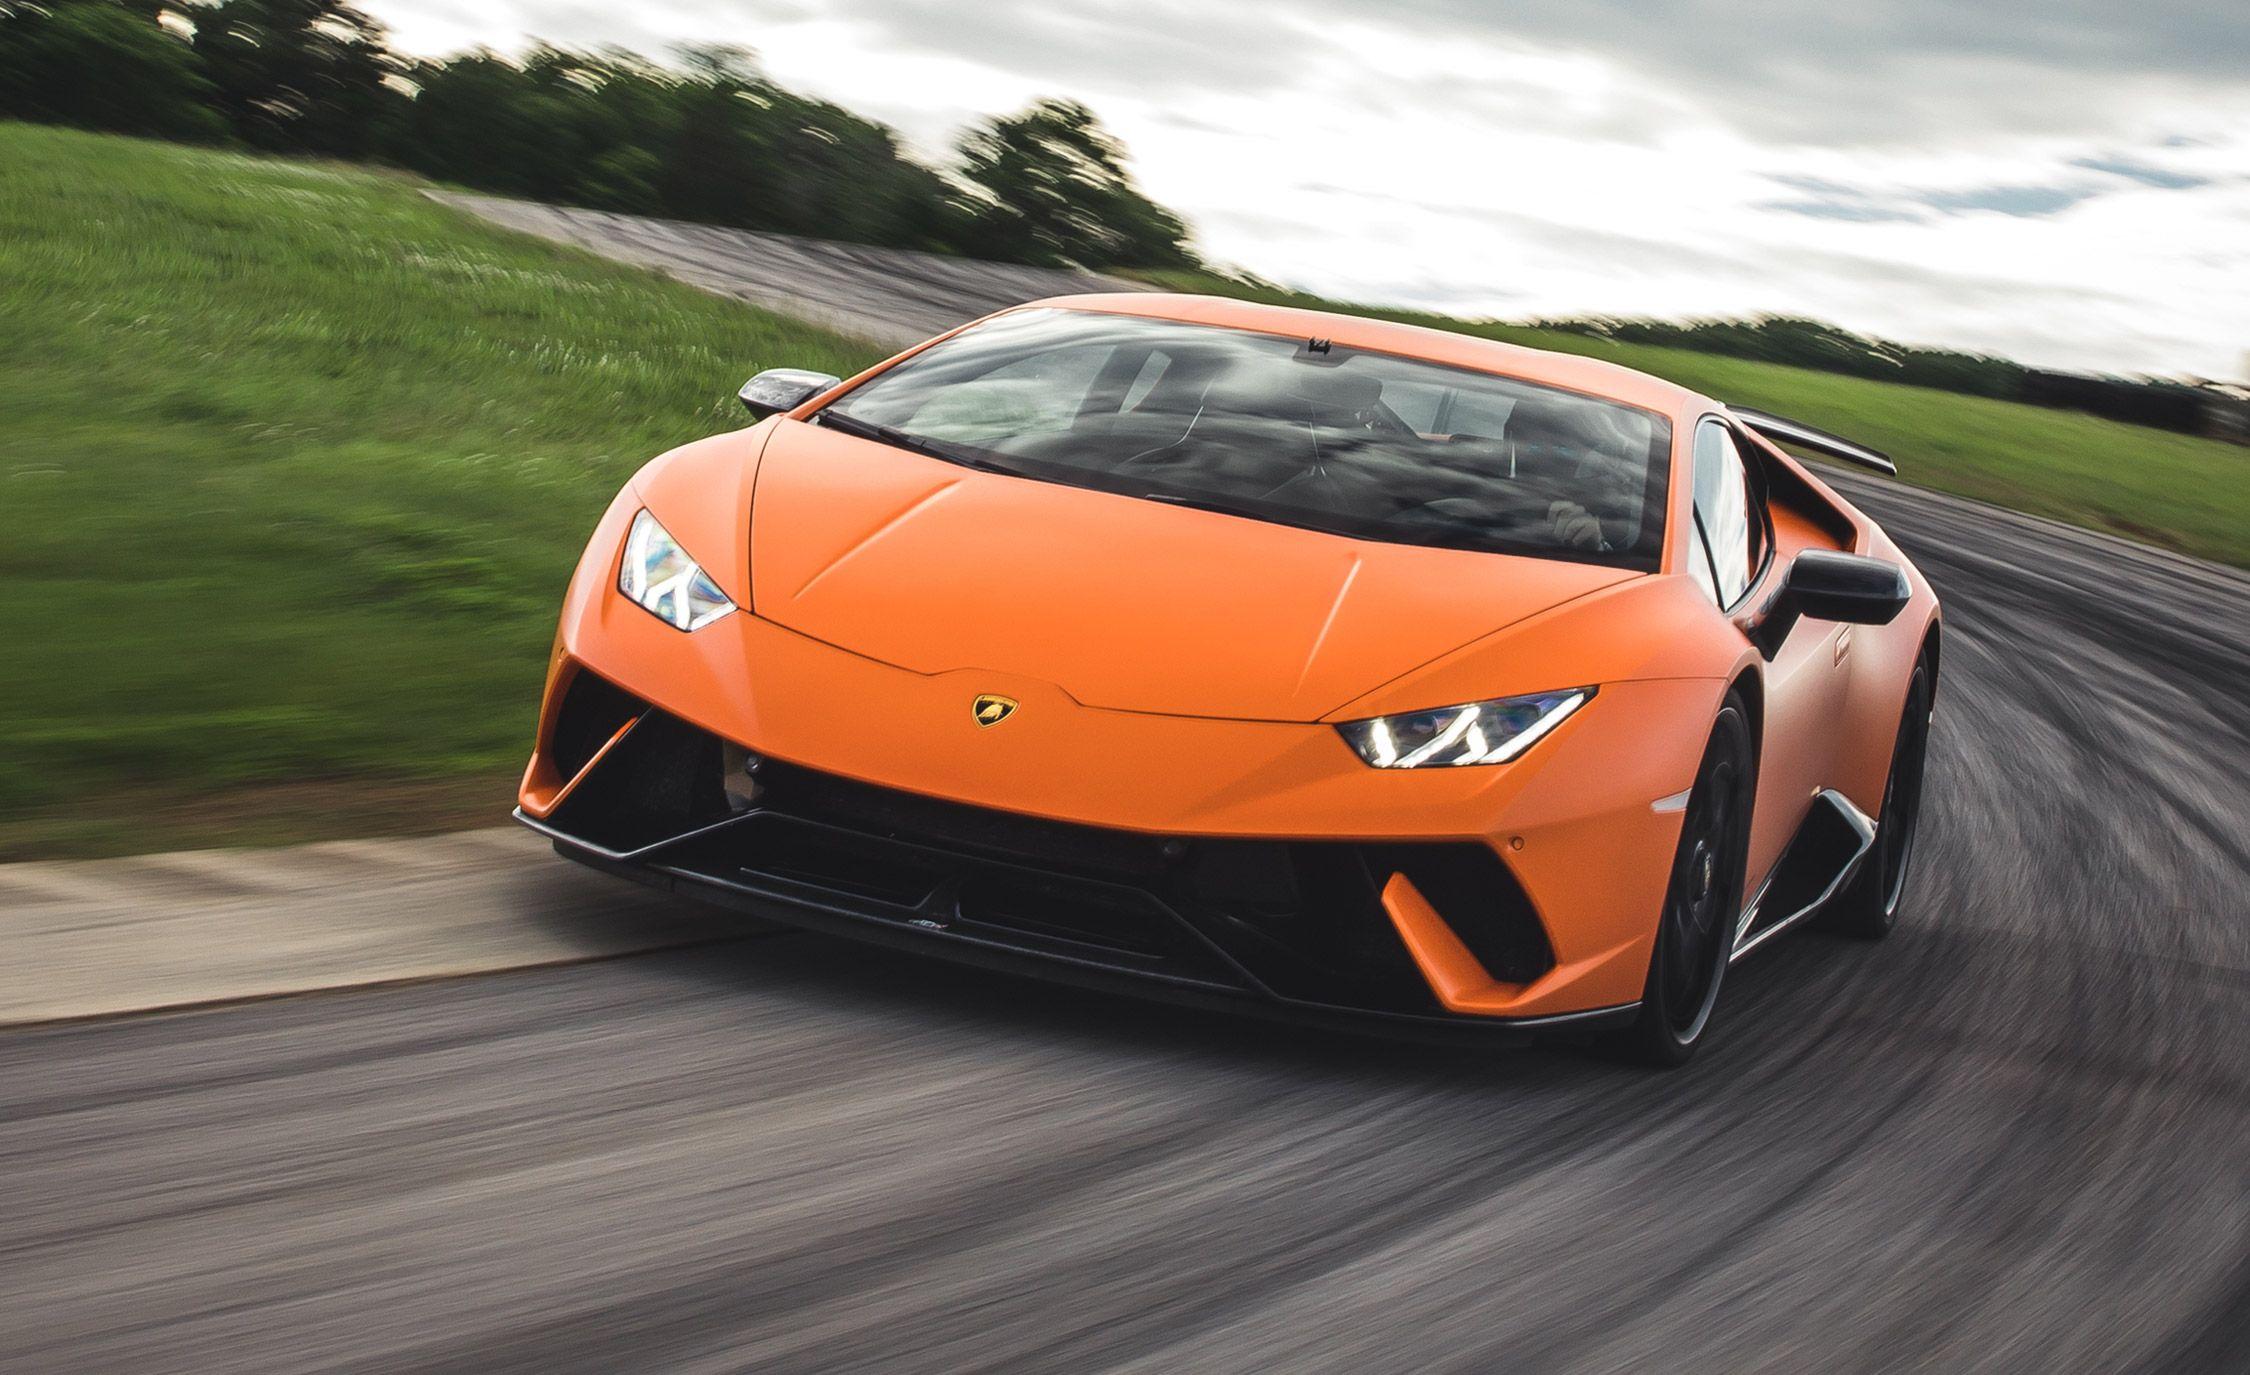 Lamborghini huracan curb weight